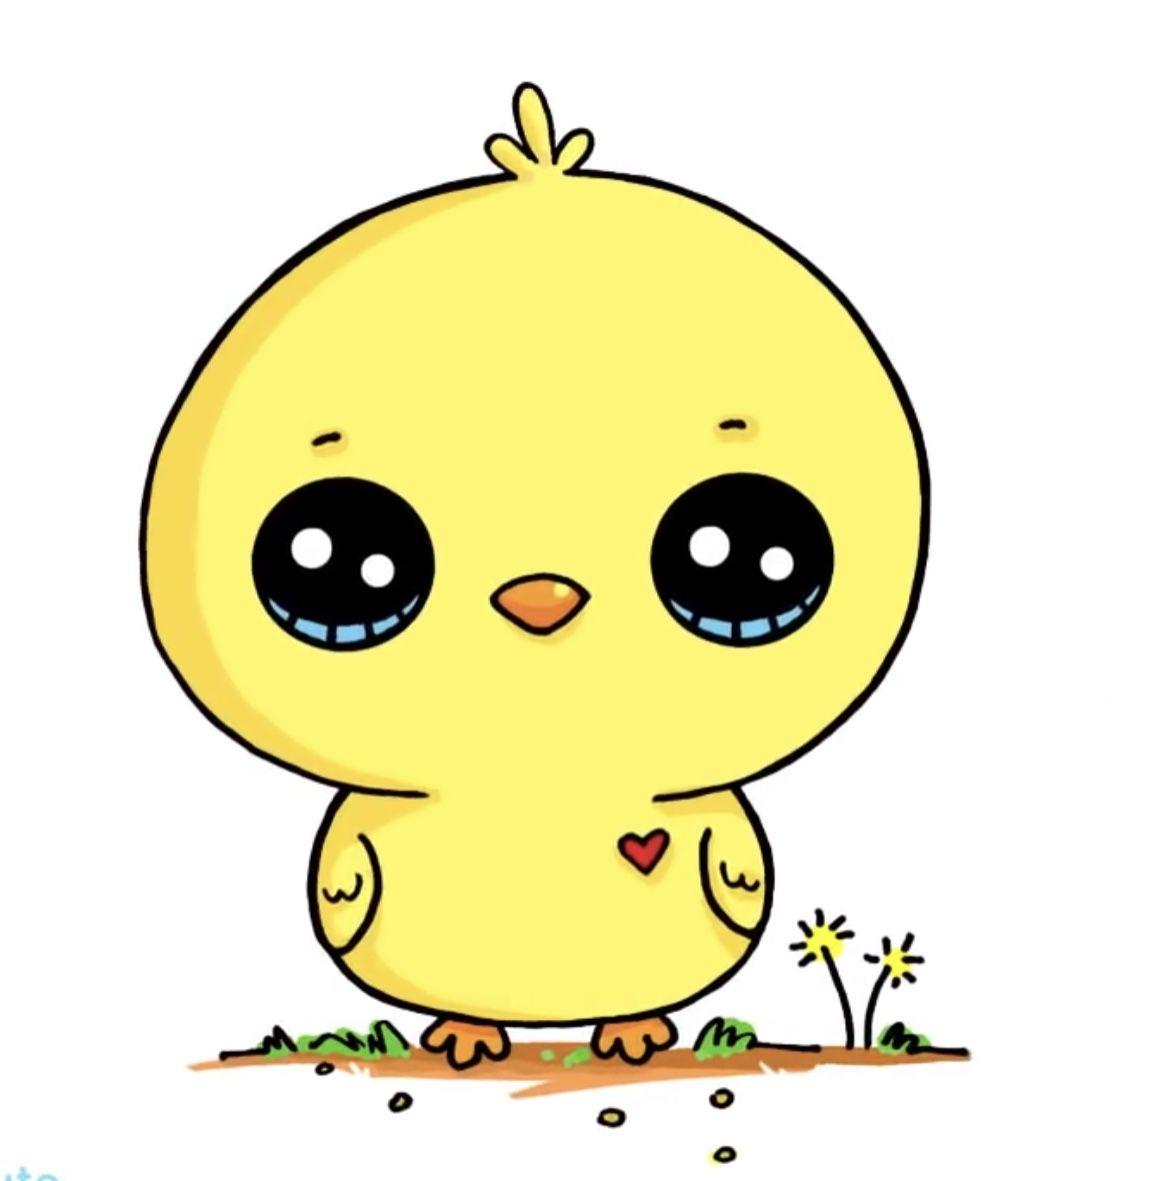 Pin By Sara On Drawing Cute Animal Drawings Kawaii Cute Little Drawings Kawaii Doodles